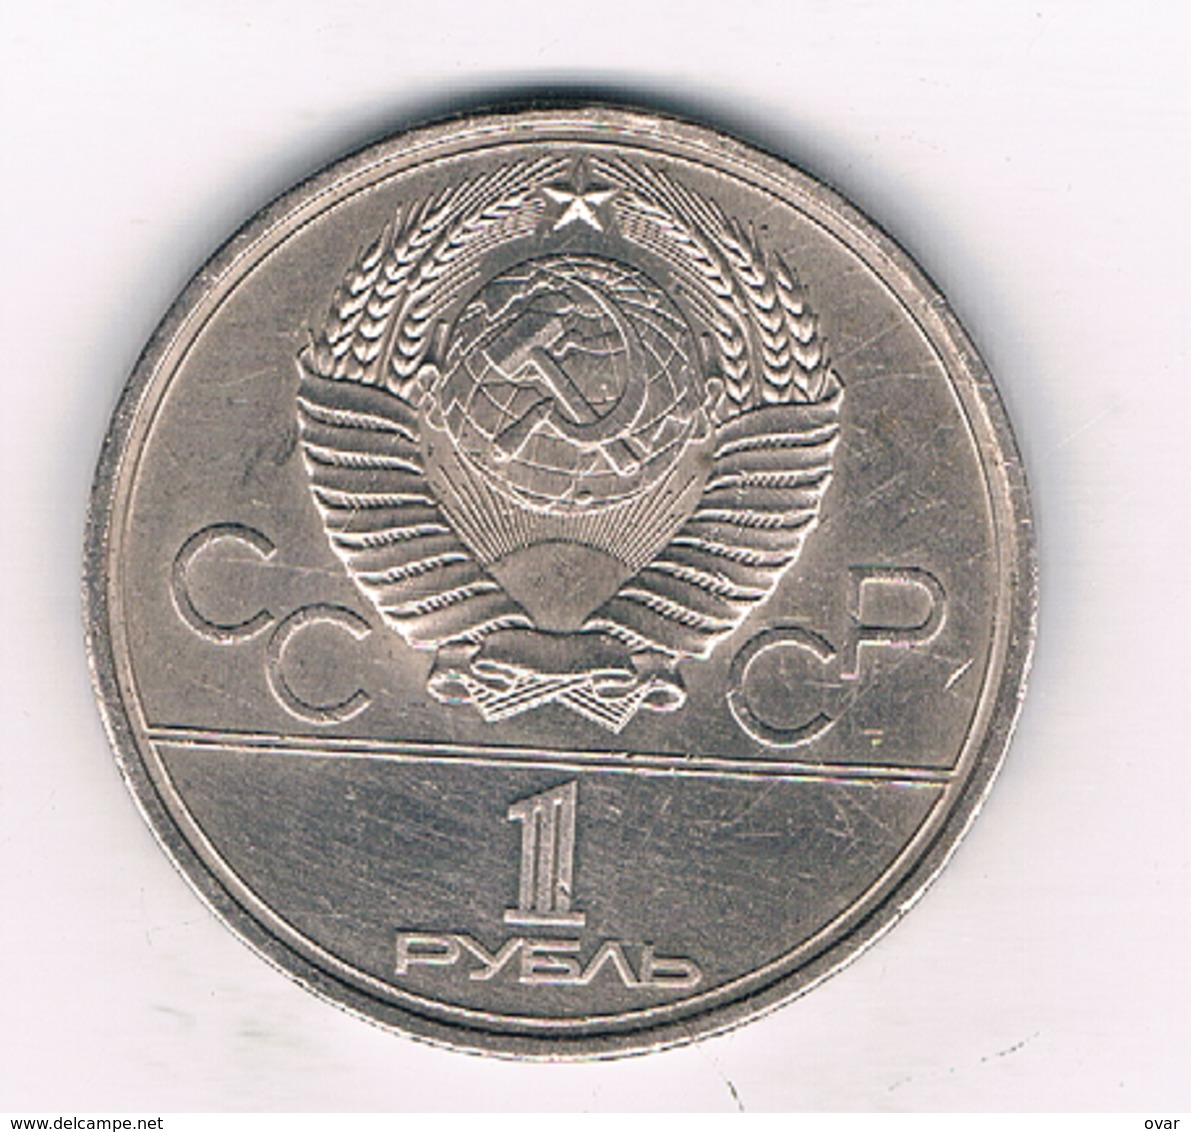 1 ROUBEL 1980  CCCP  RUSLAND /5135/ - Russie